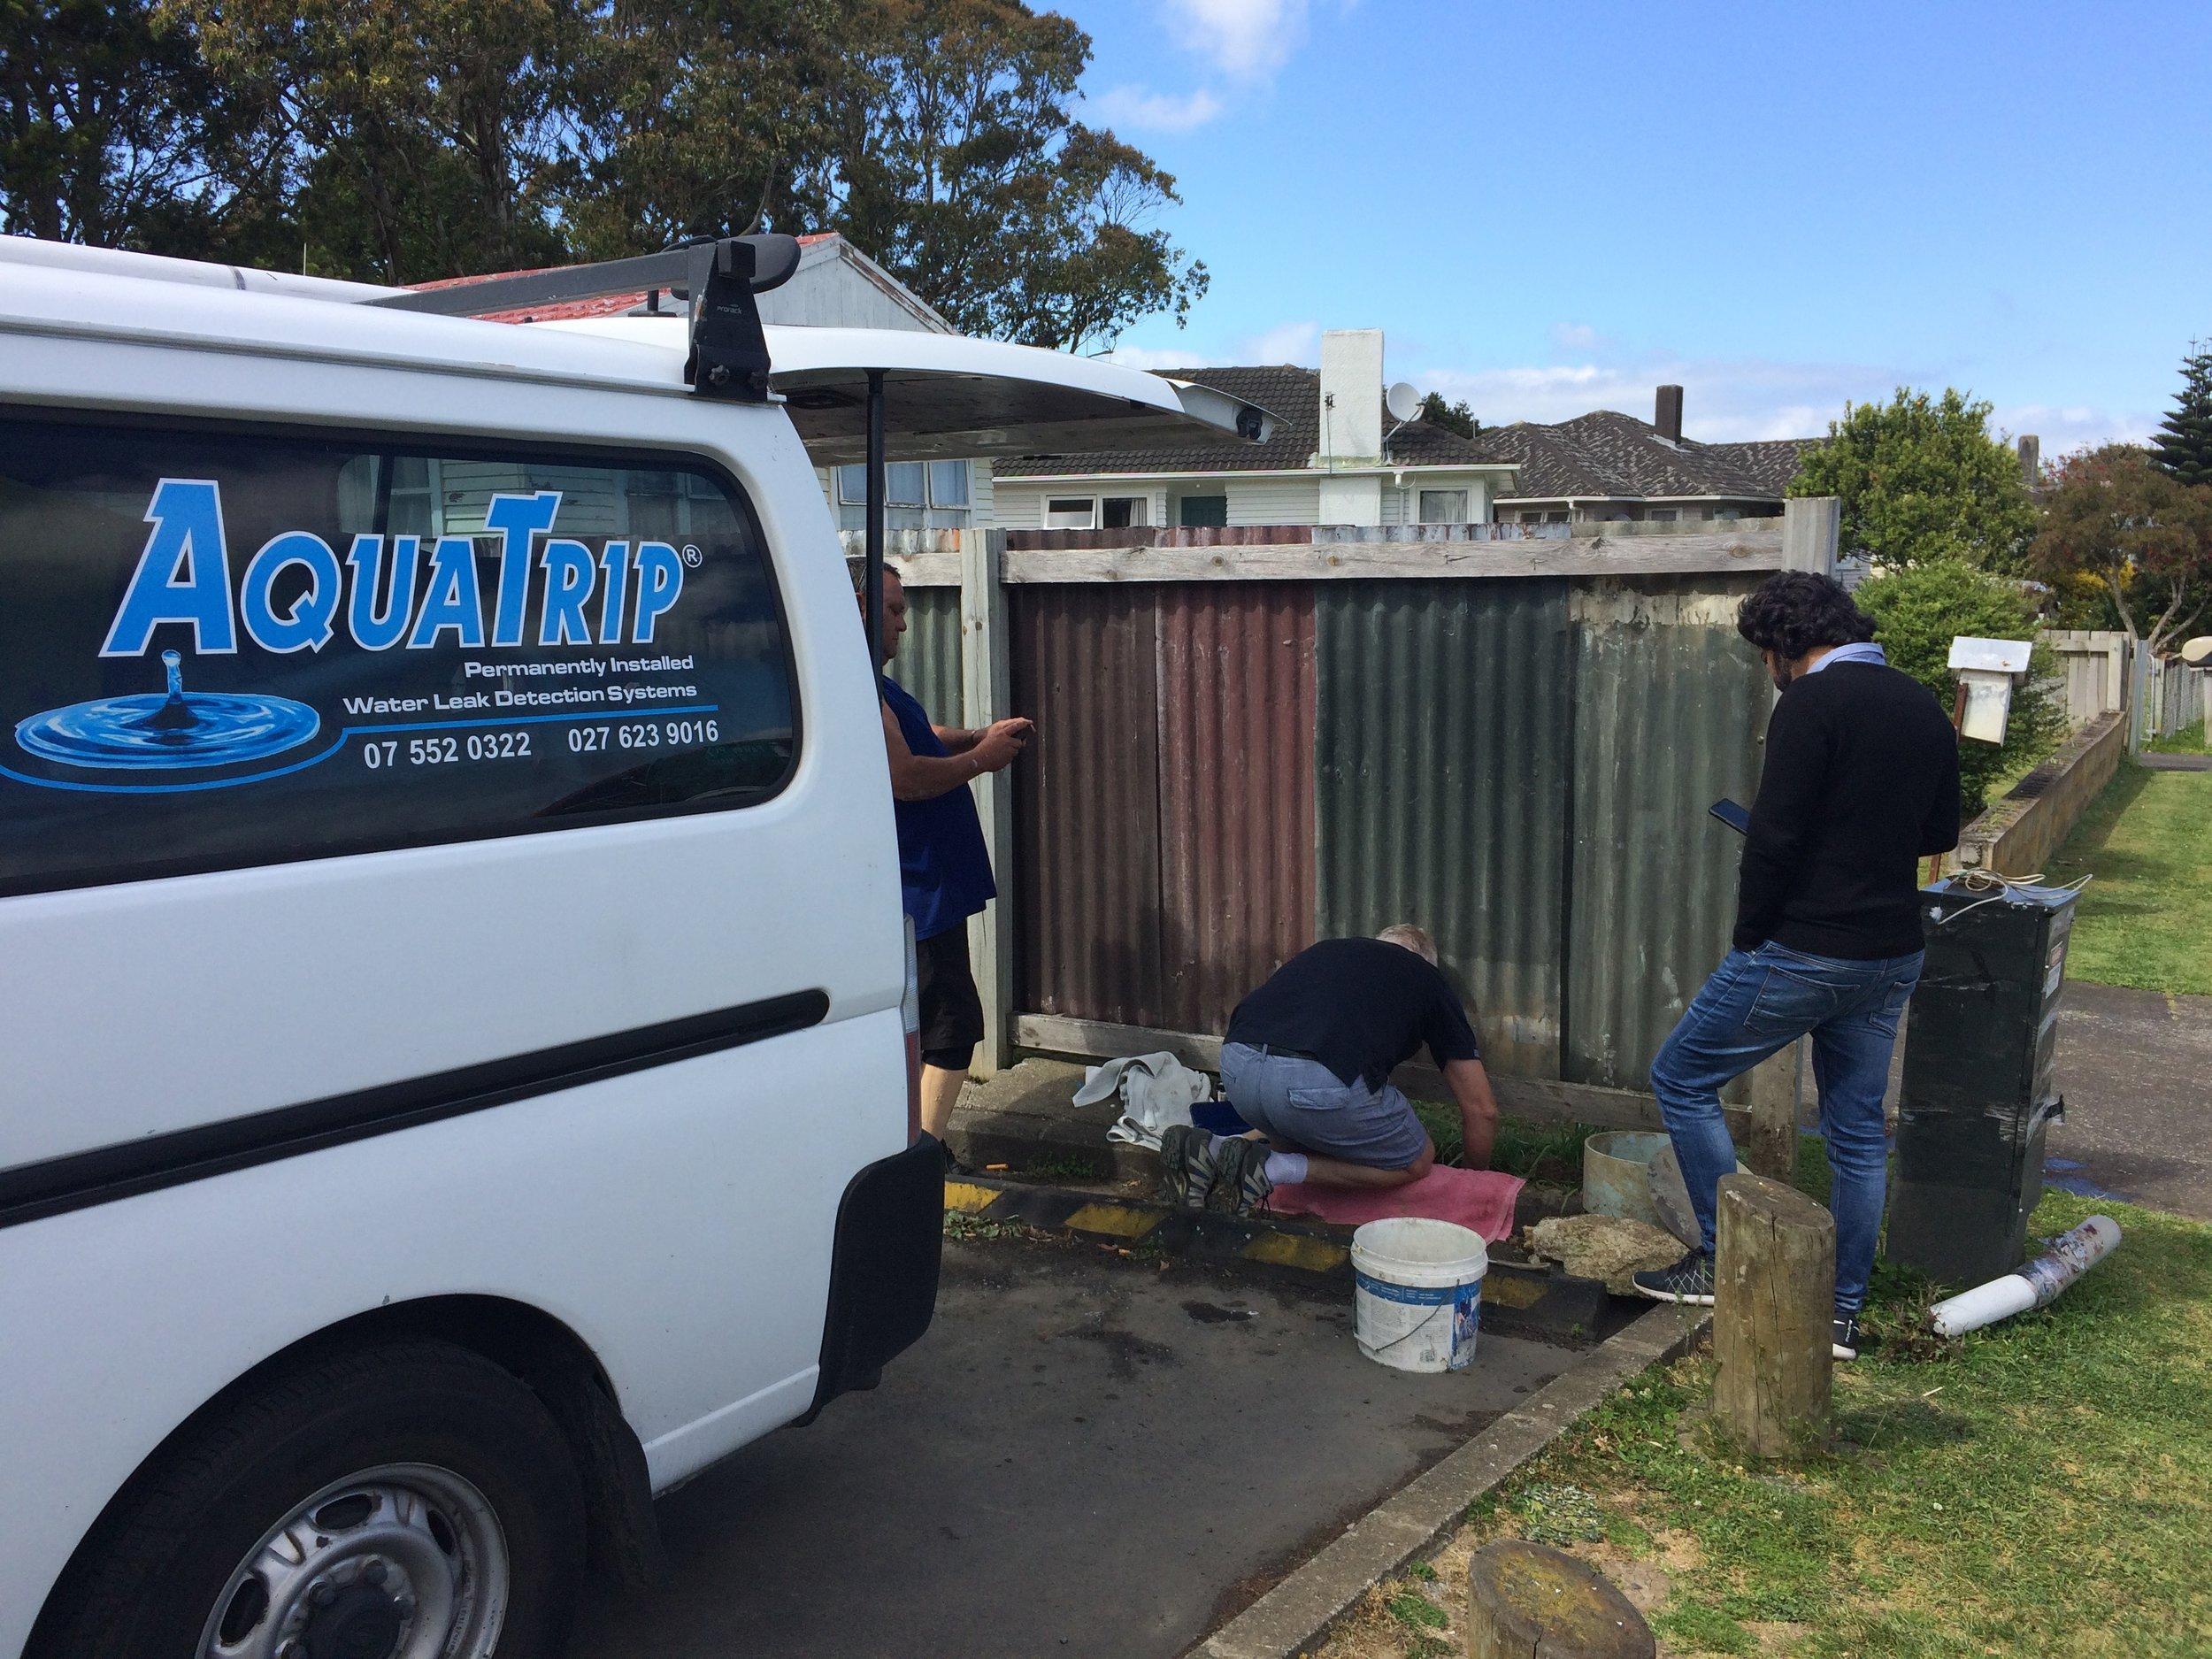 AquaTrip installation at Manukau Rovers RFC